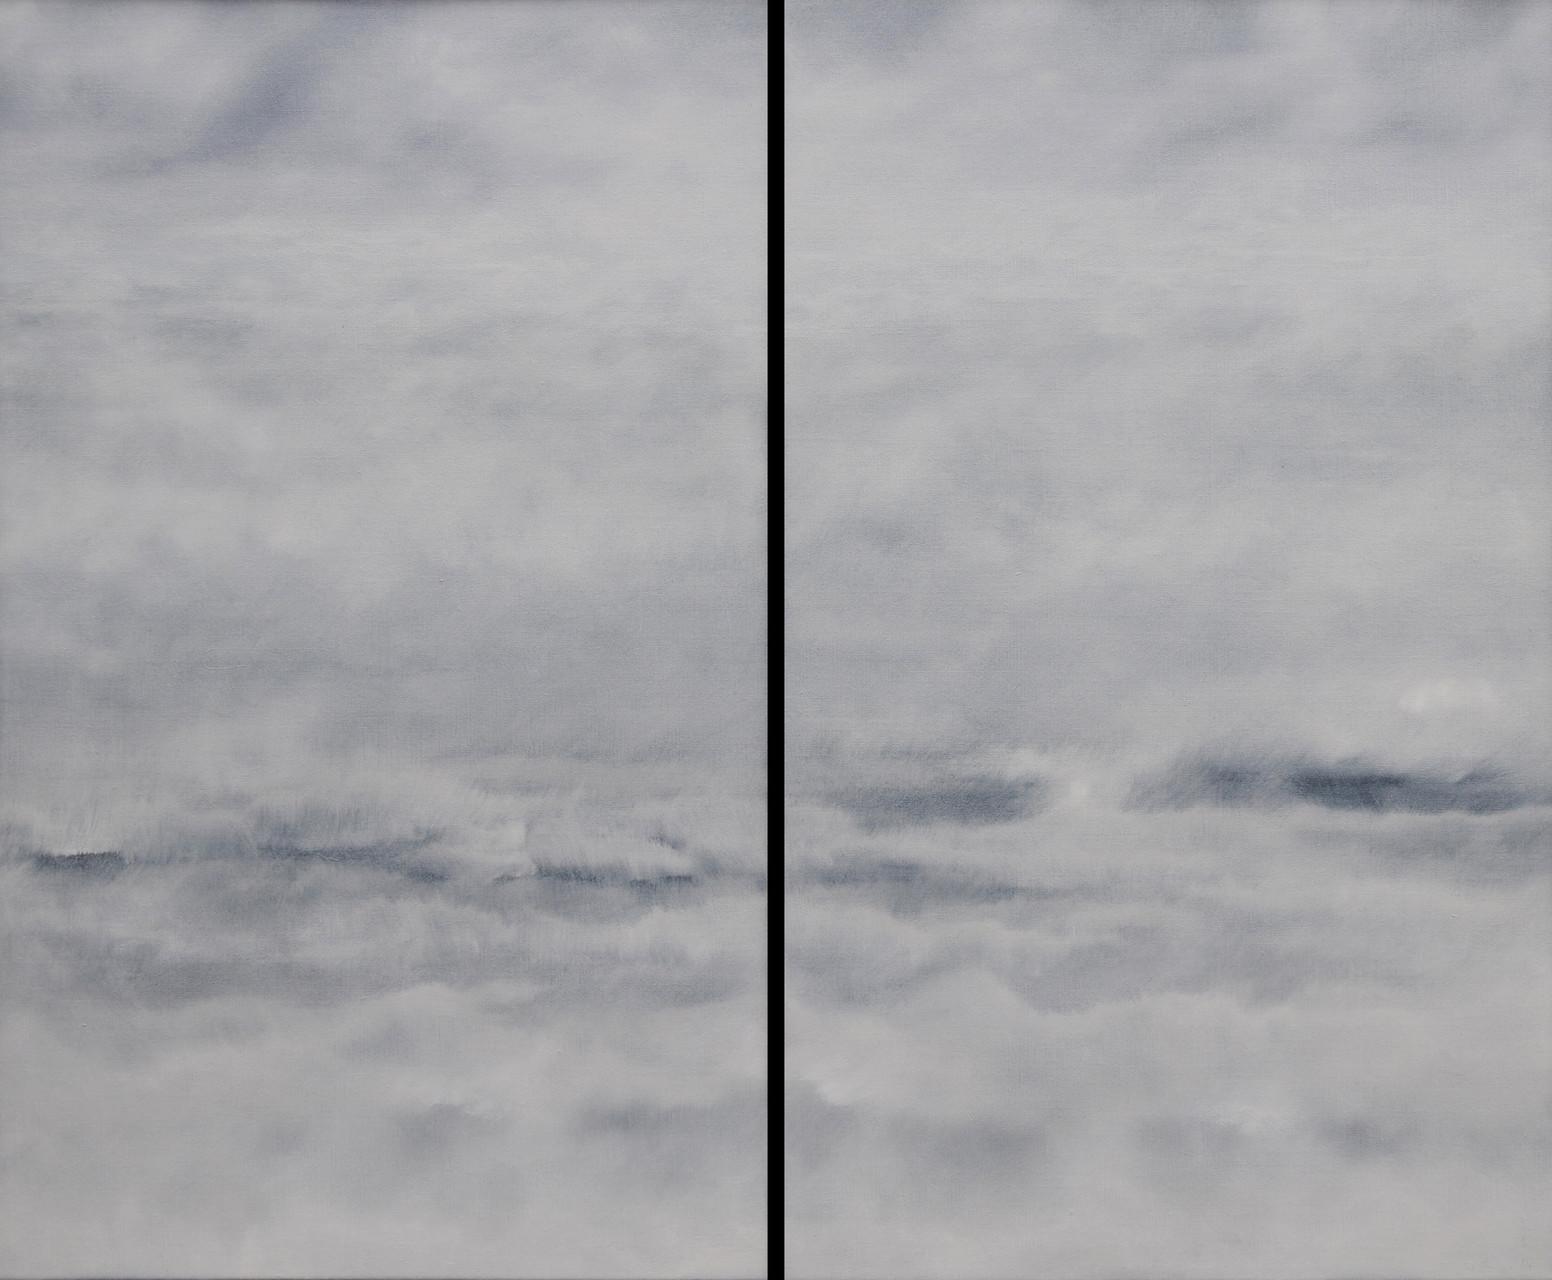 OHNE TITEL, Diptychon, 2015, Öl/Lwd., 2 x 100 x 60cm